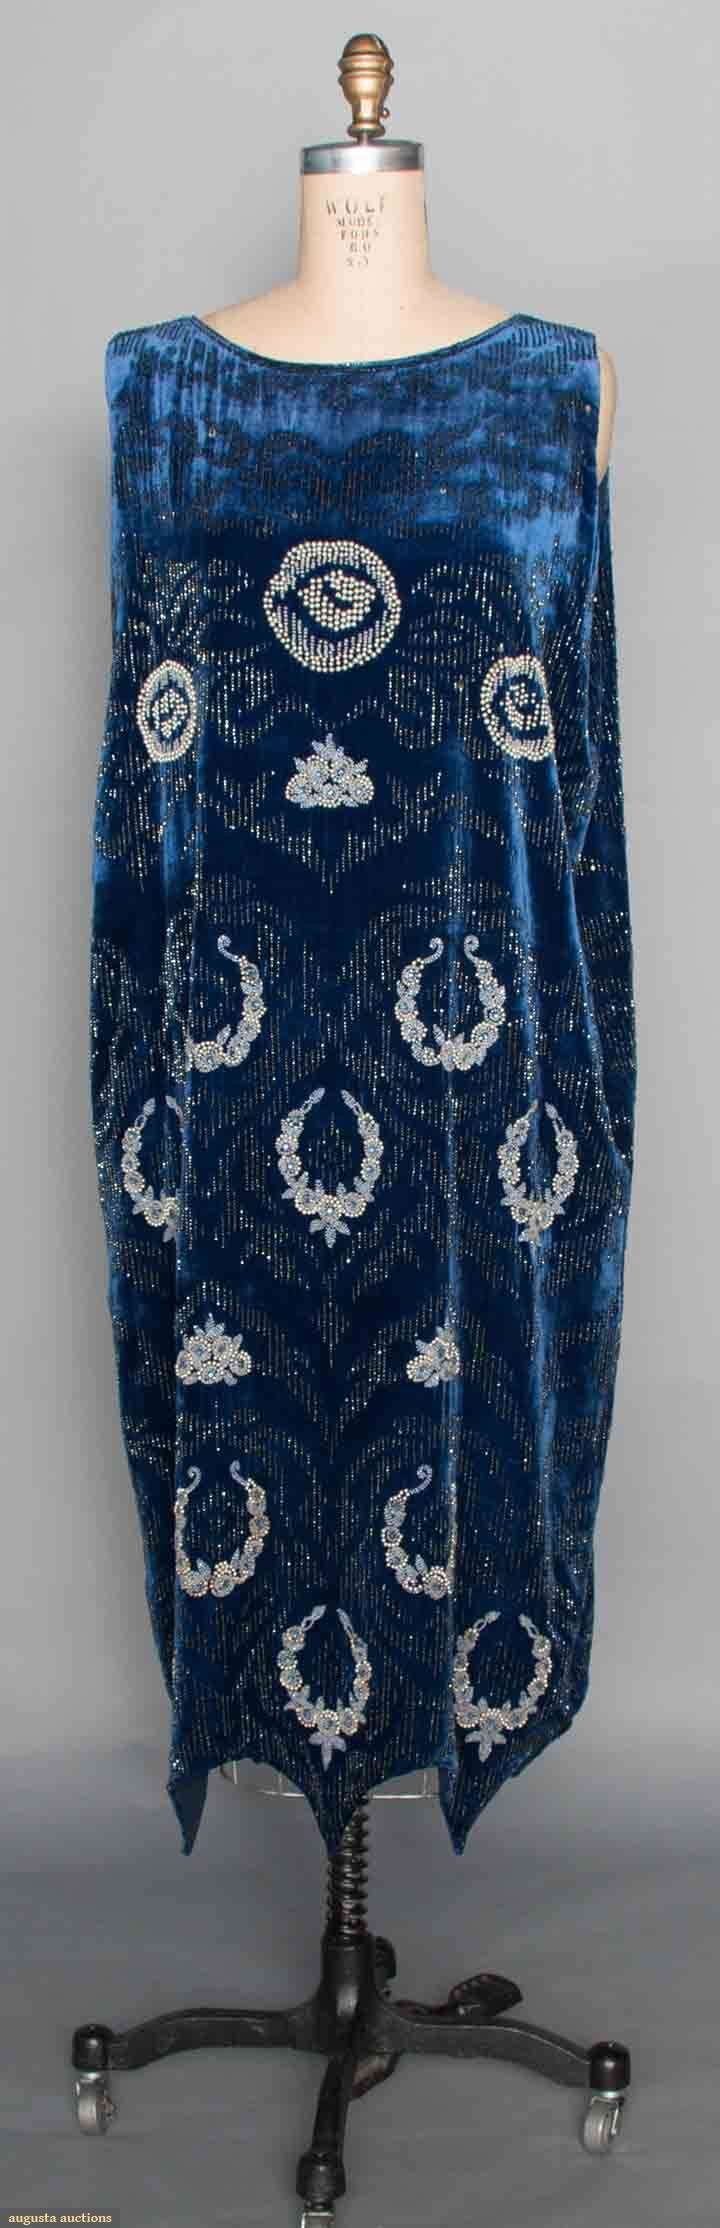 Beaded Blue Velvet Gown, C. 1920. Sapphire silk velvet, sleeveless, reverse scalloped hem, embellished w/ pearls & white beaded round blossoms above repeat patterns of pearls, crystal bead & blue rhinestone flower clusters & wreaths, bead motifs framed w/ blue carnival glass beaded ground, silk lining (hva)